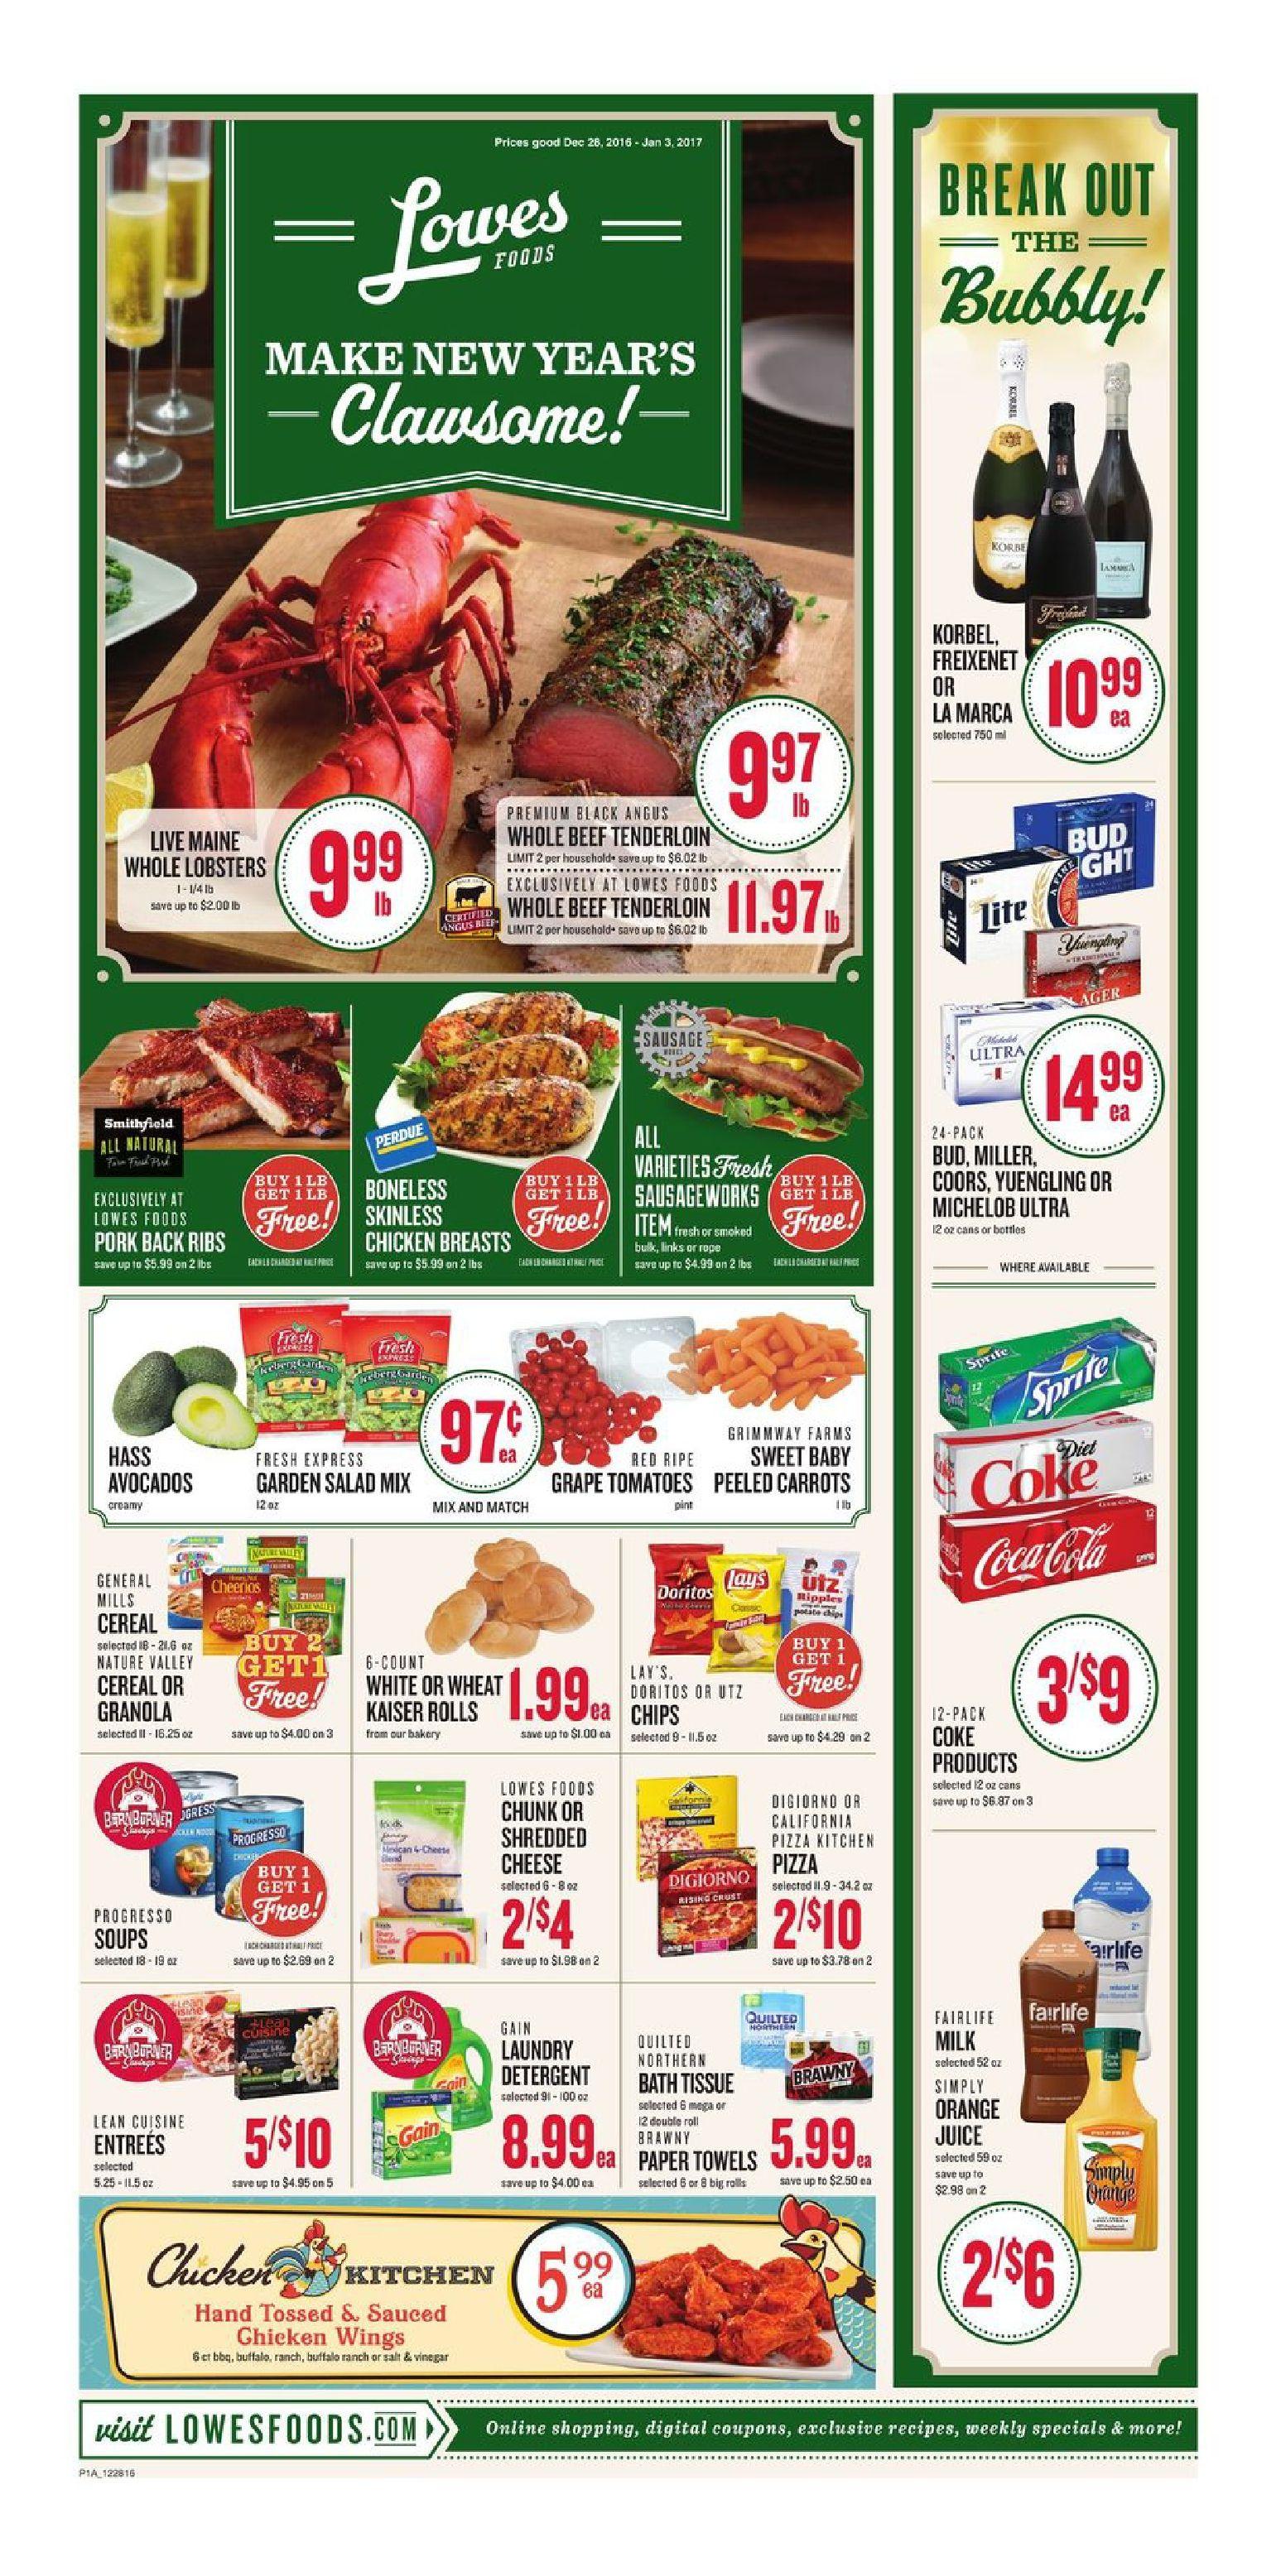 Lowes Weekly Ad December 28